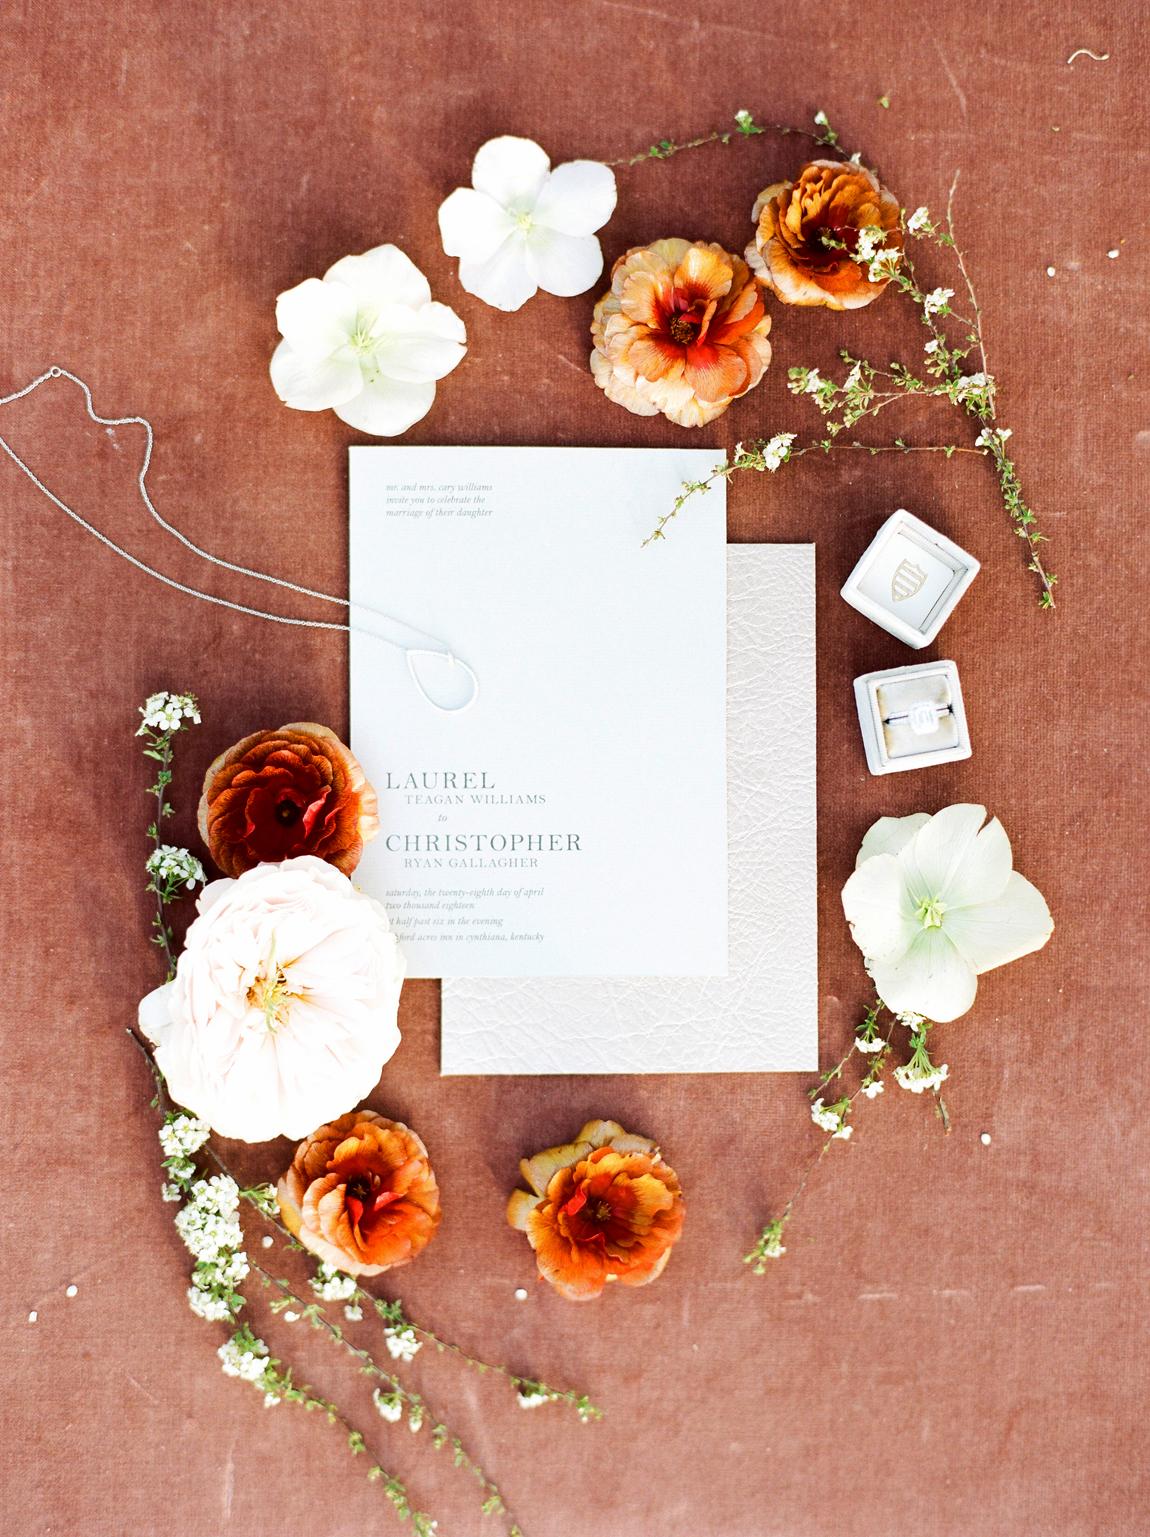 Tangerine and Marsala wedding color scheme